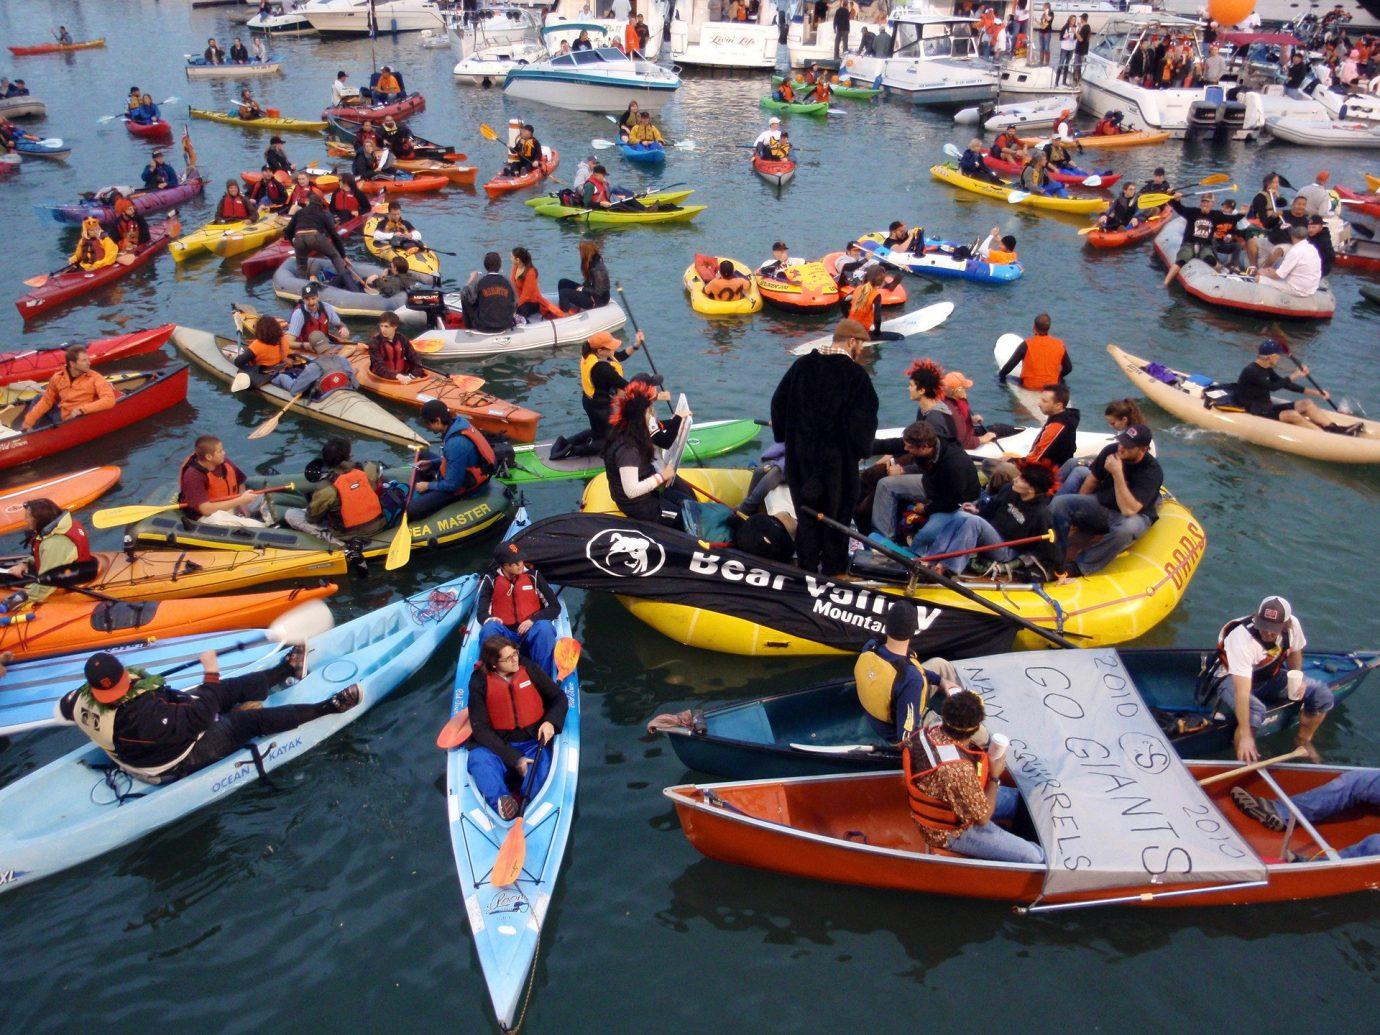 Trip Ideas Boat boating vehicle watercraft sea kayak sports kayak paddle Rowing water sport boat racing several